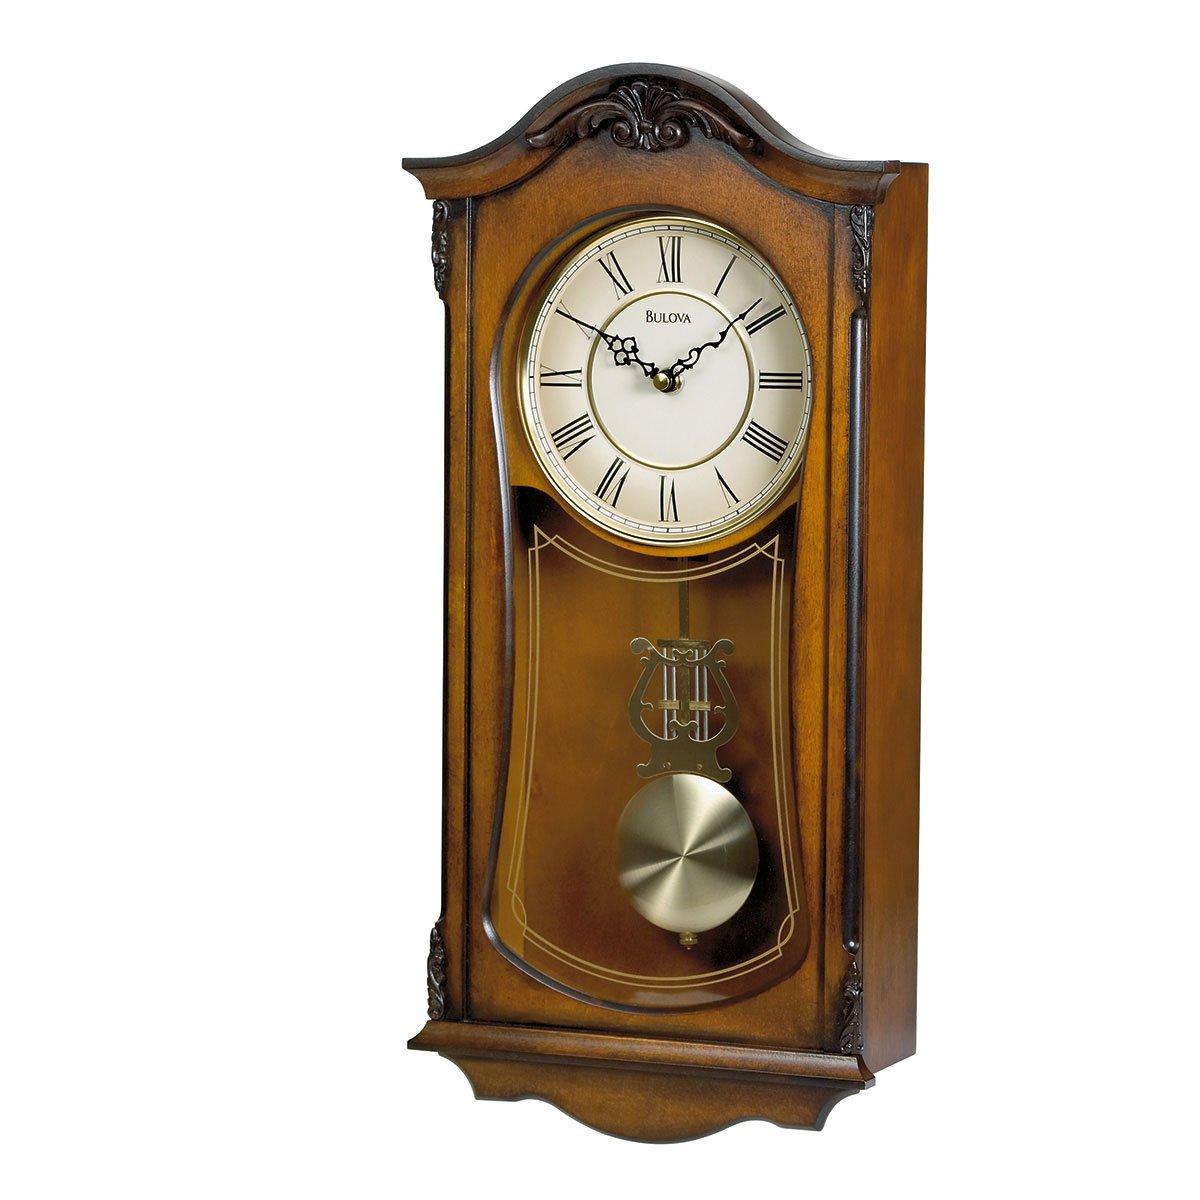 Reloj Bulova de Pared, Madera Sólida